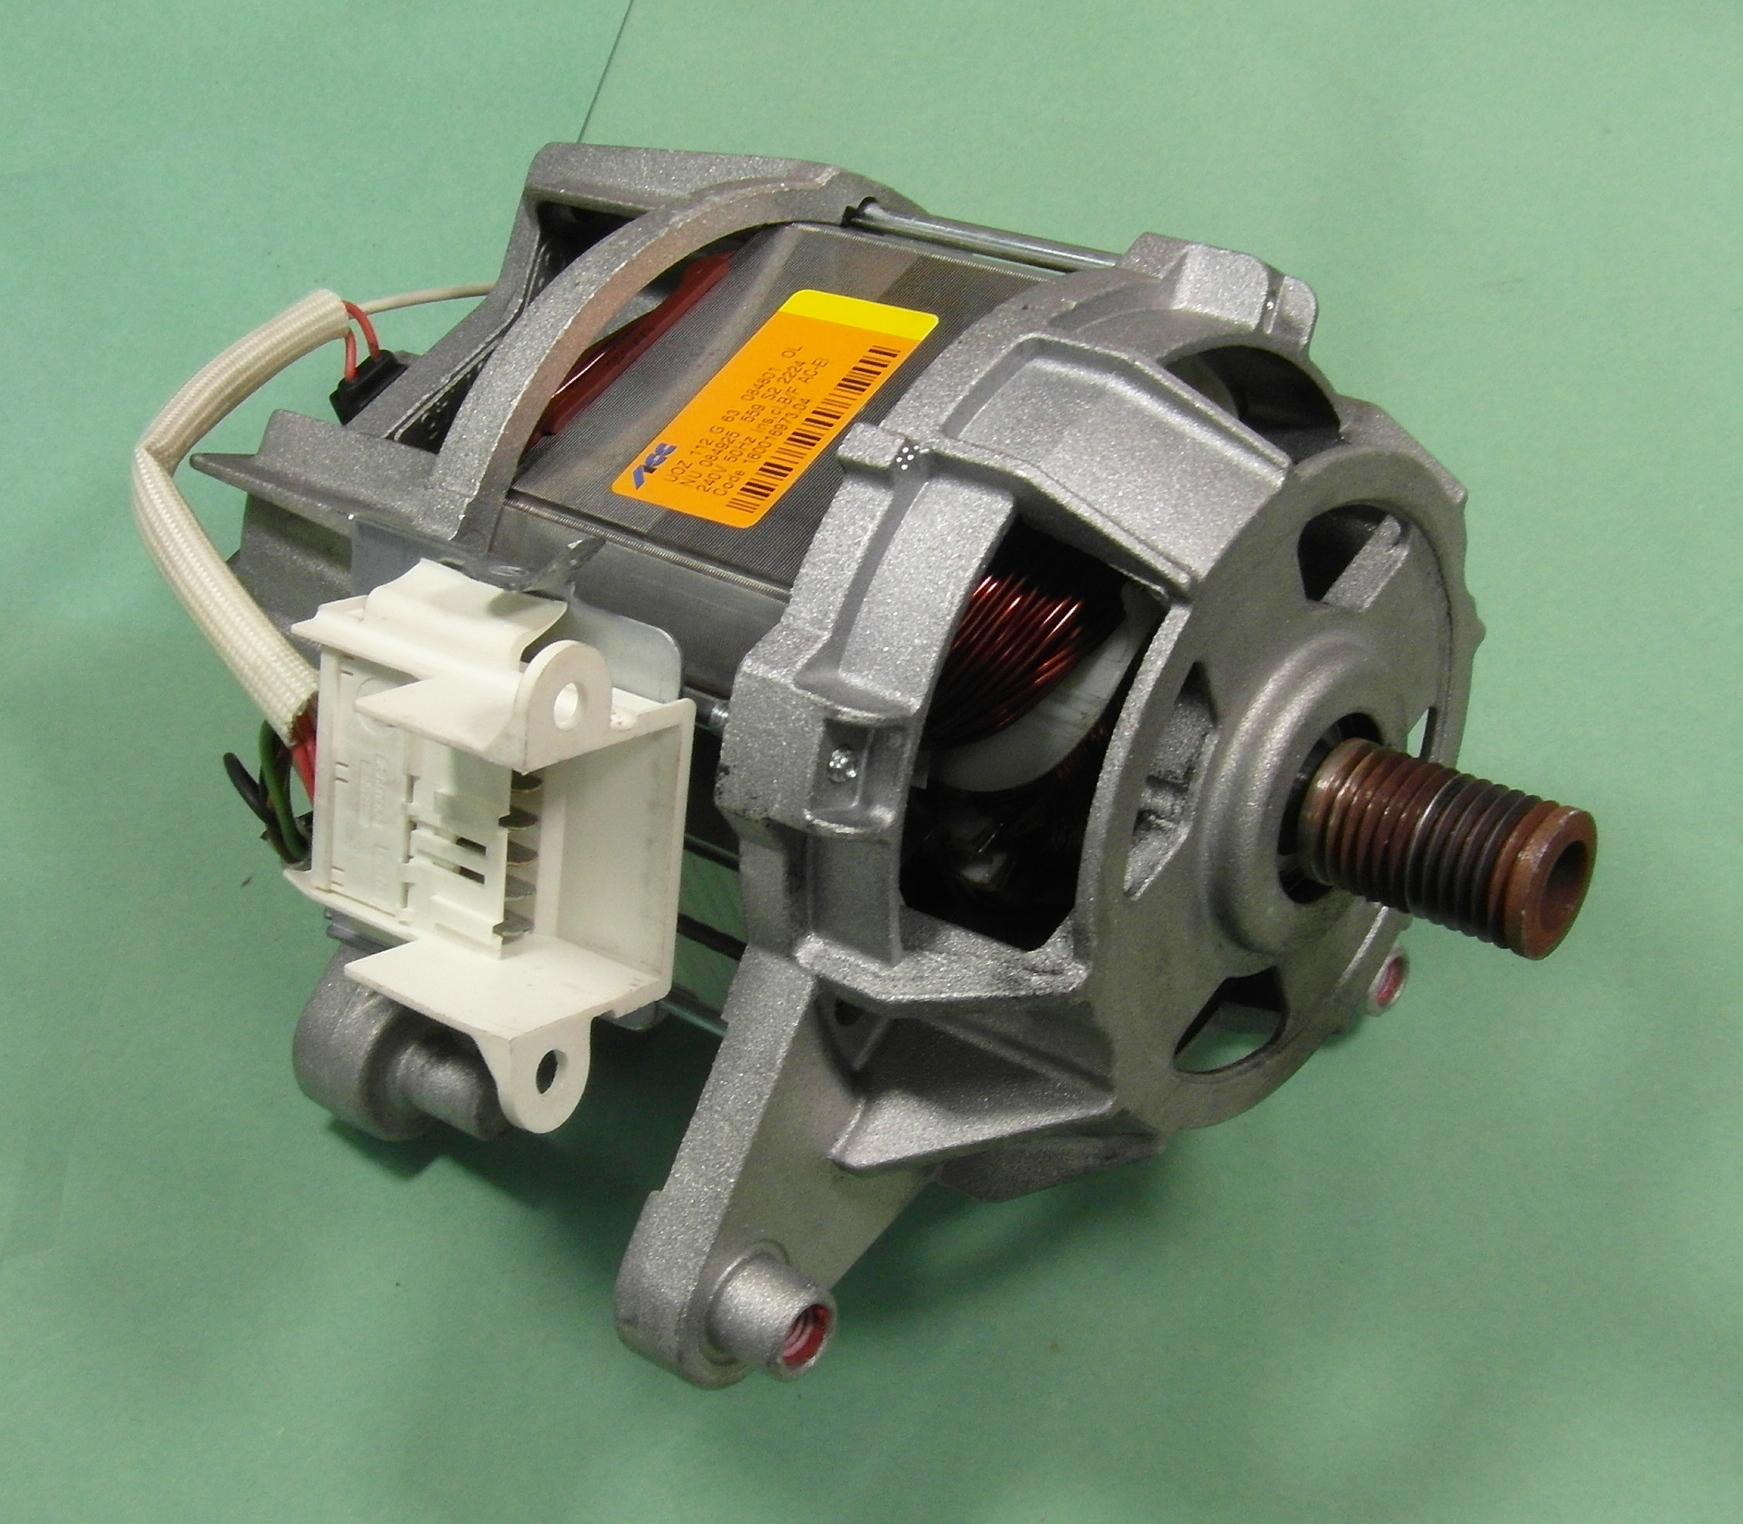 Hotpoint Aquarius Wd440 Washer Dryer Motor Acc Uoz 112 G